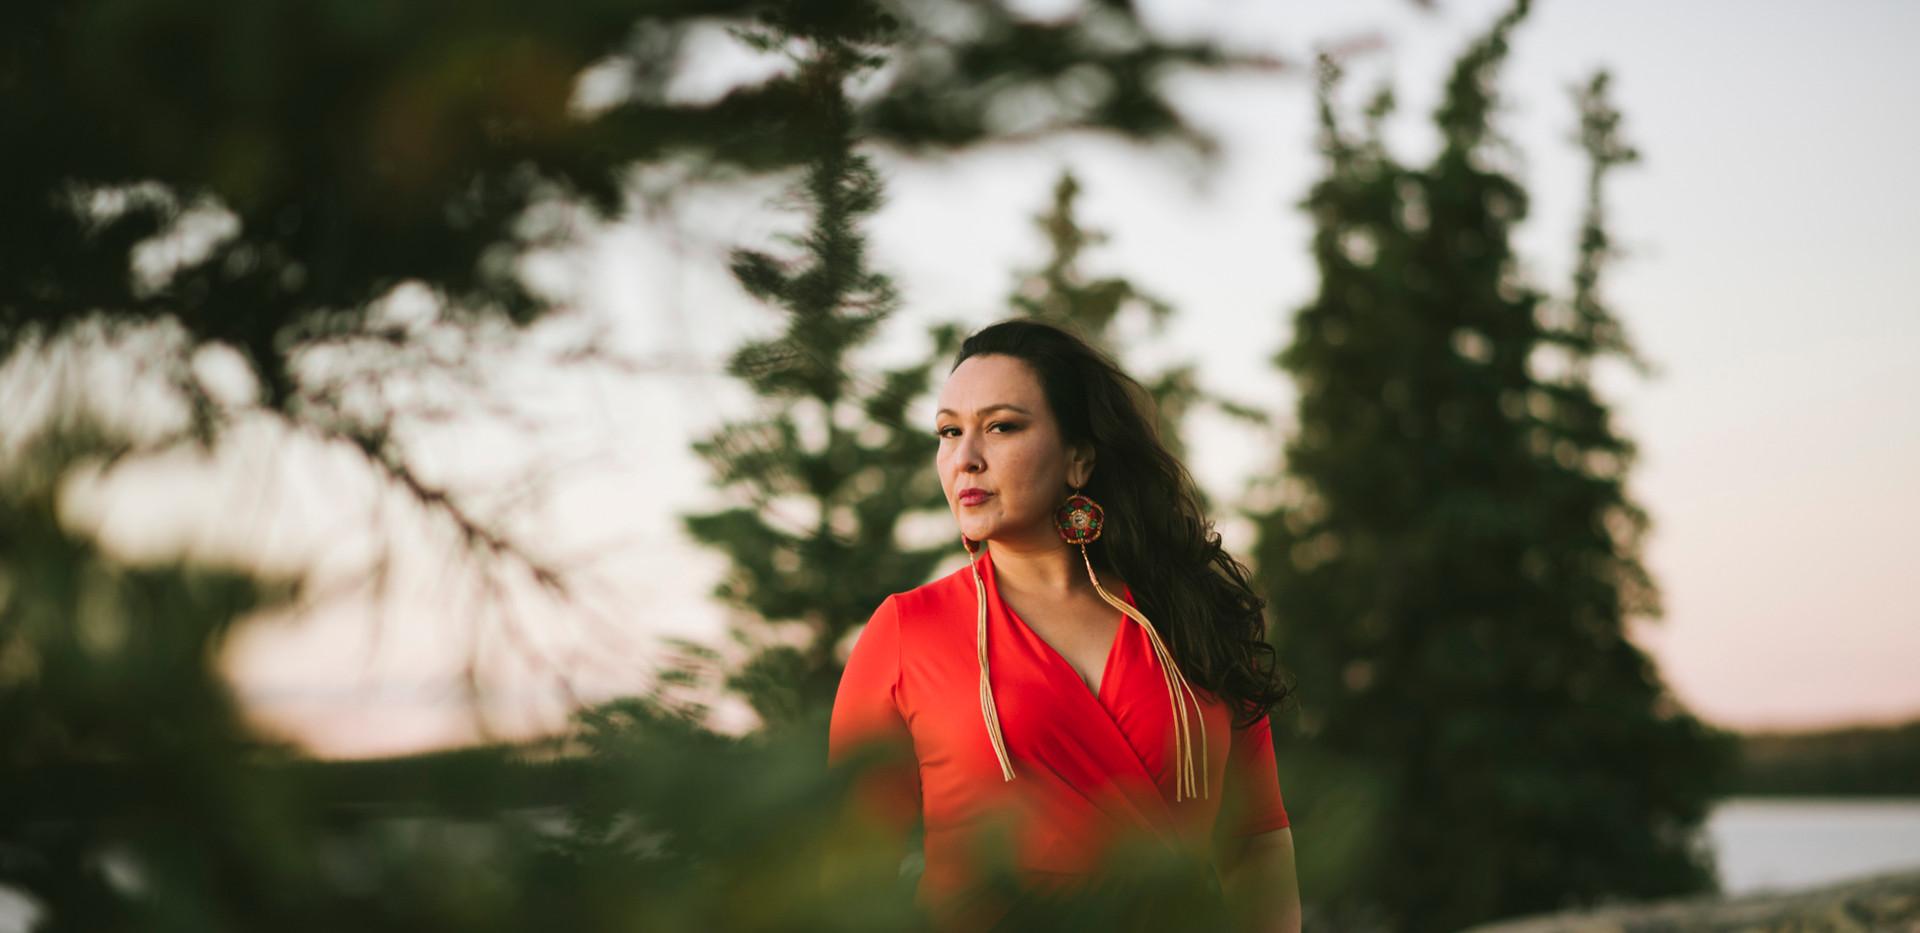 Leela Gilday - Red Dress Forest